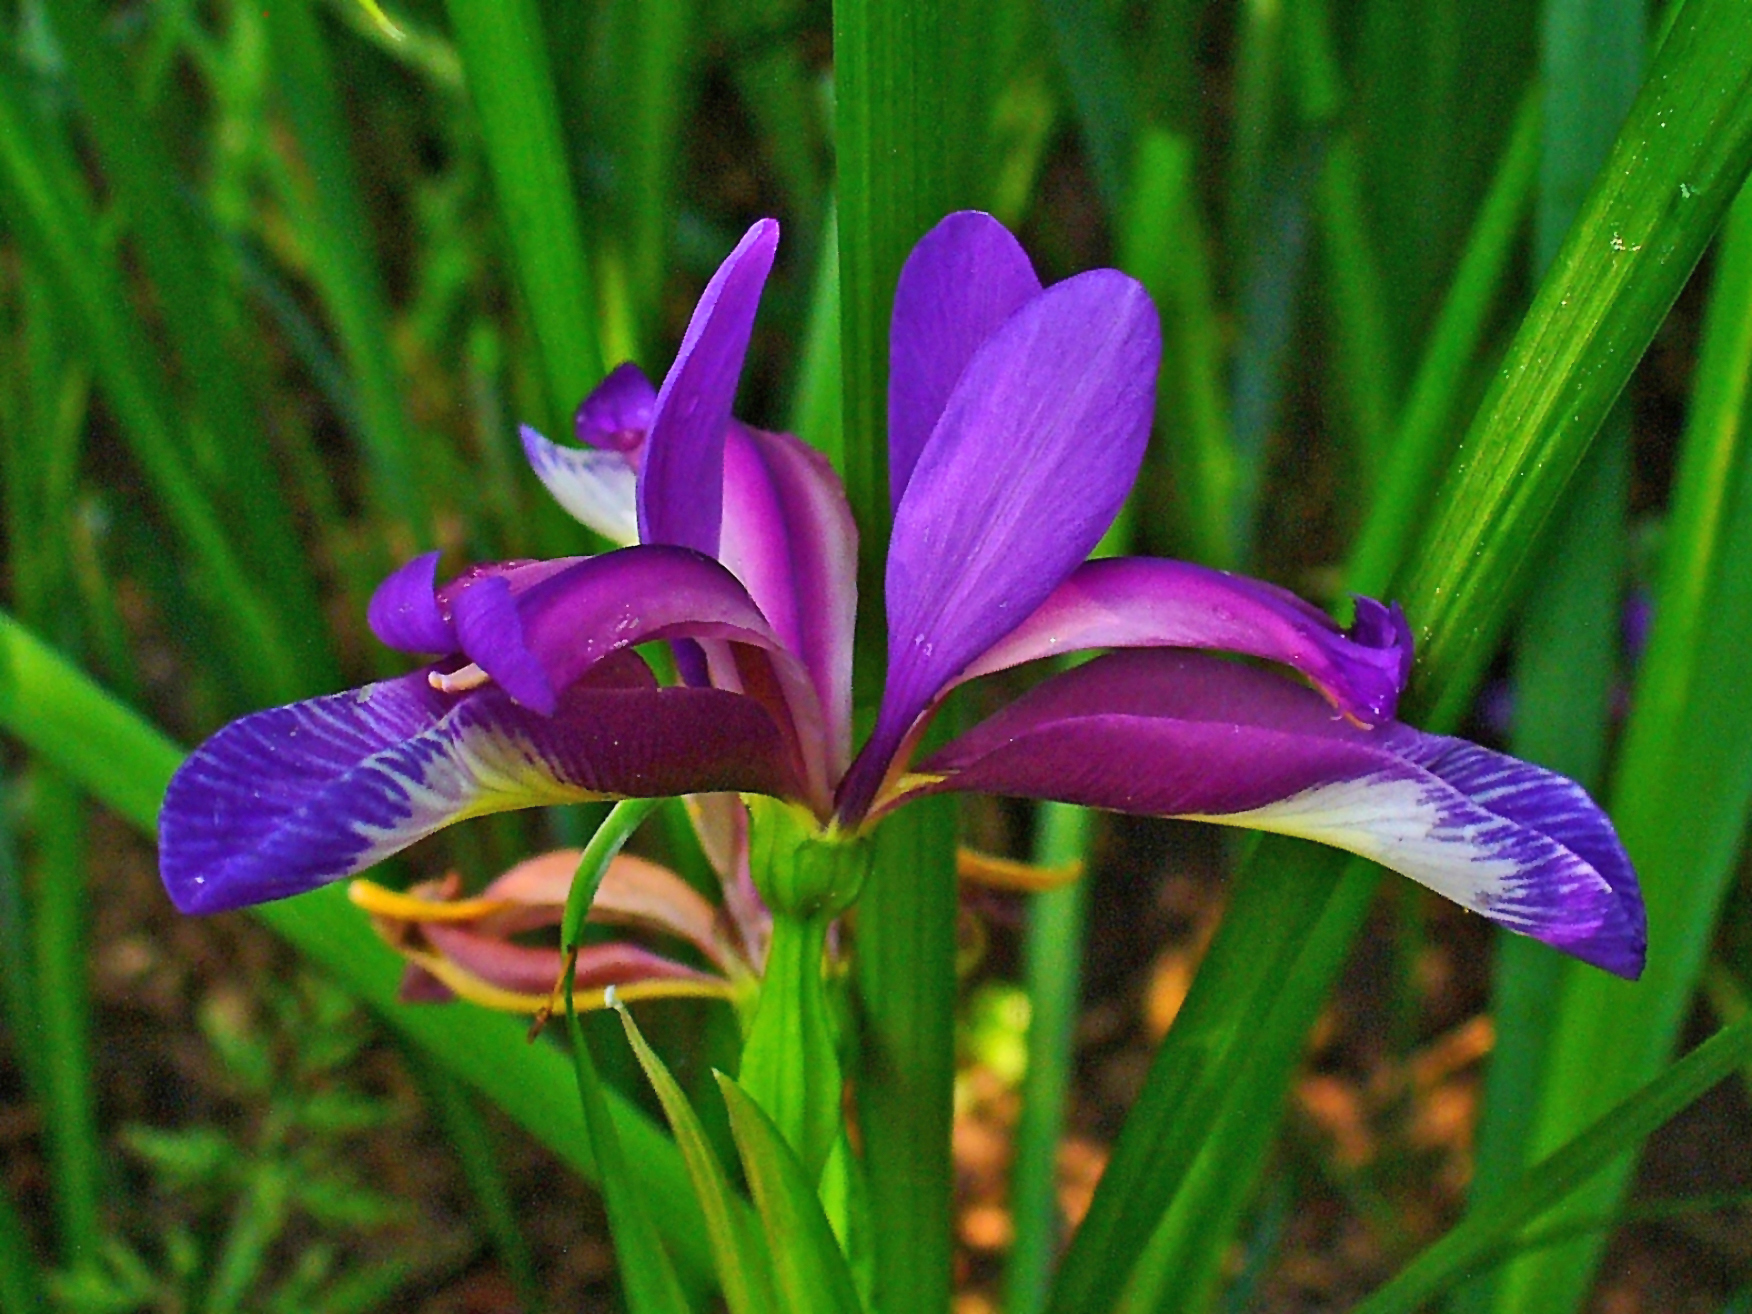 File:Iris graminea 003.JPG - Wikimedia Commons